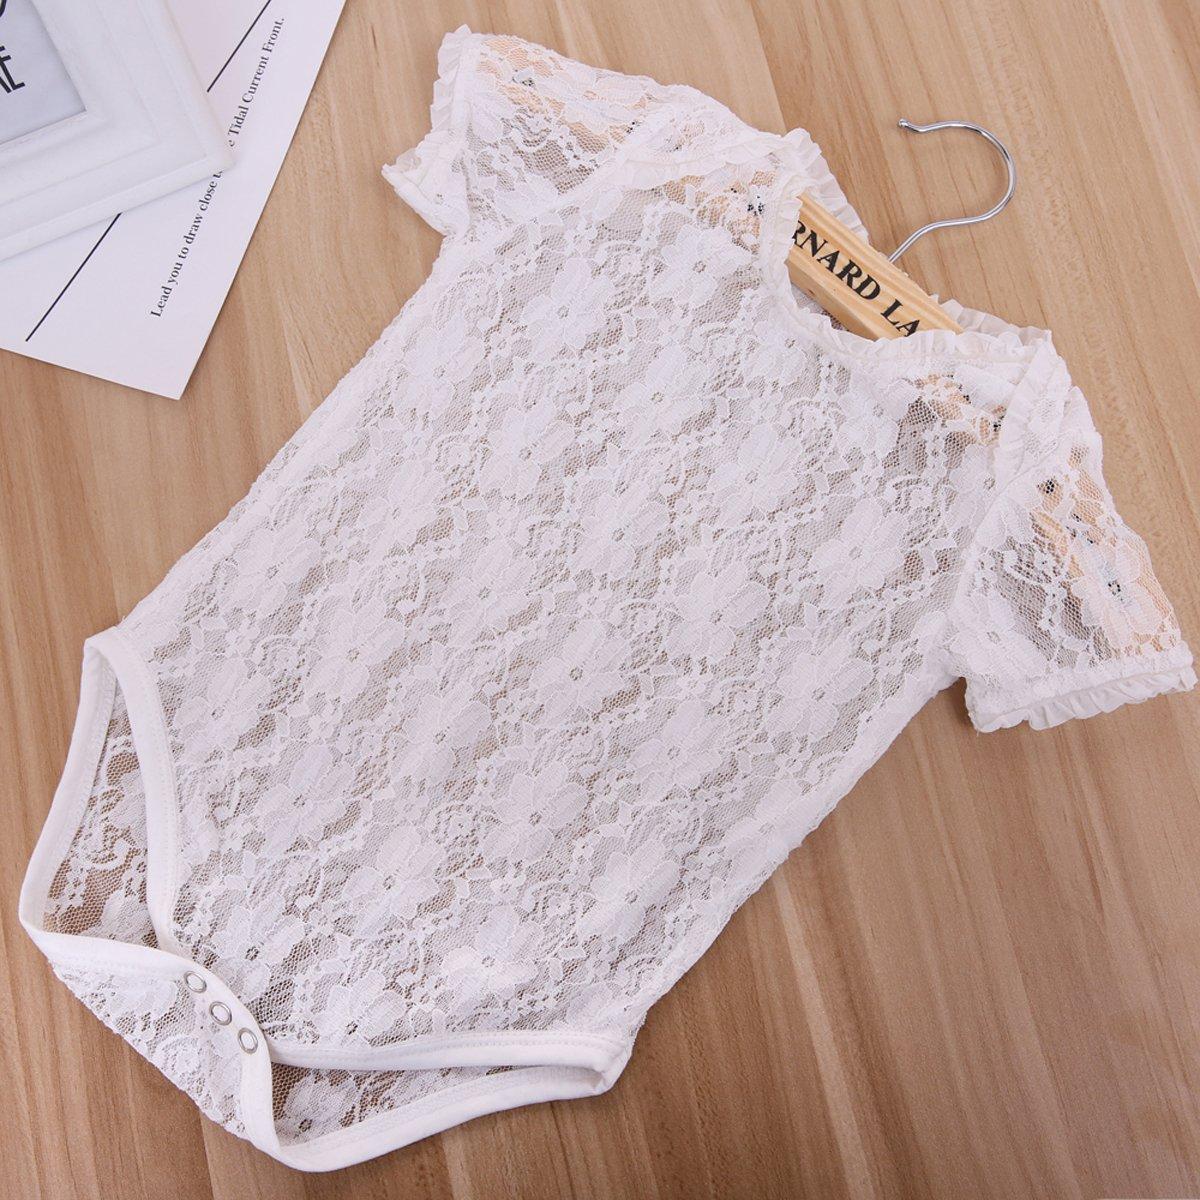 32fd575e4b35 2017 Toddler Infant Newborn Girls Sheer White Lace Floral Romper ...